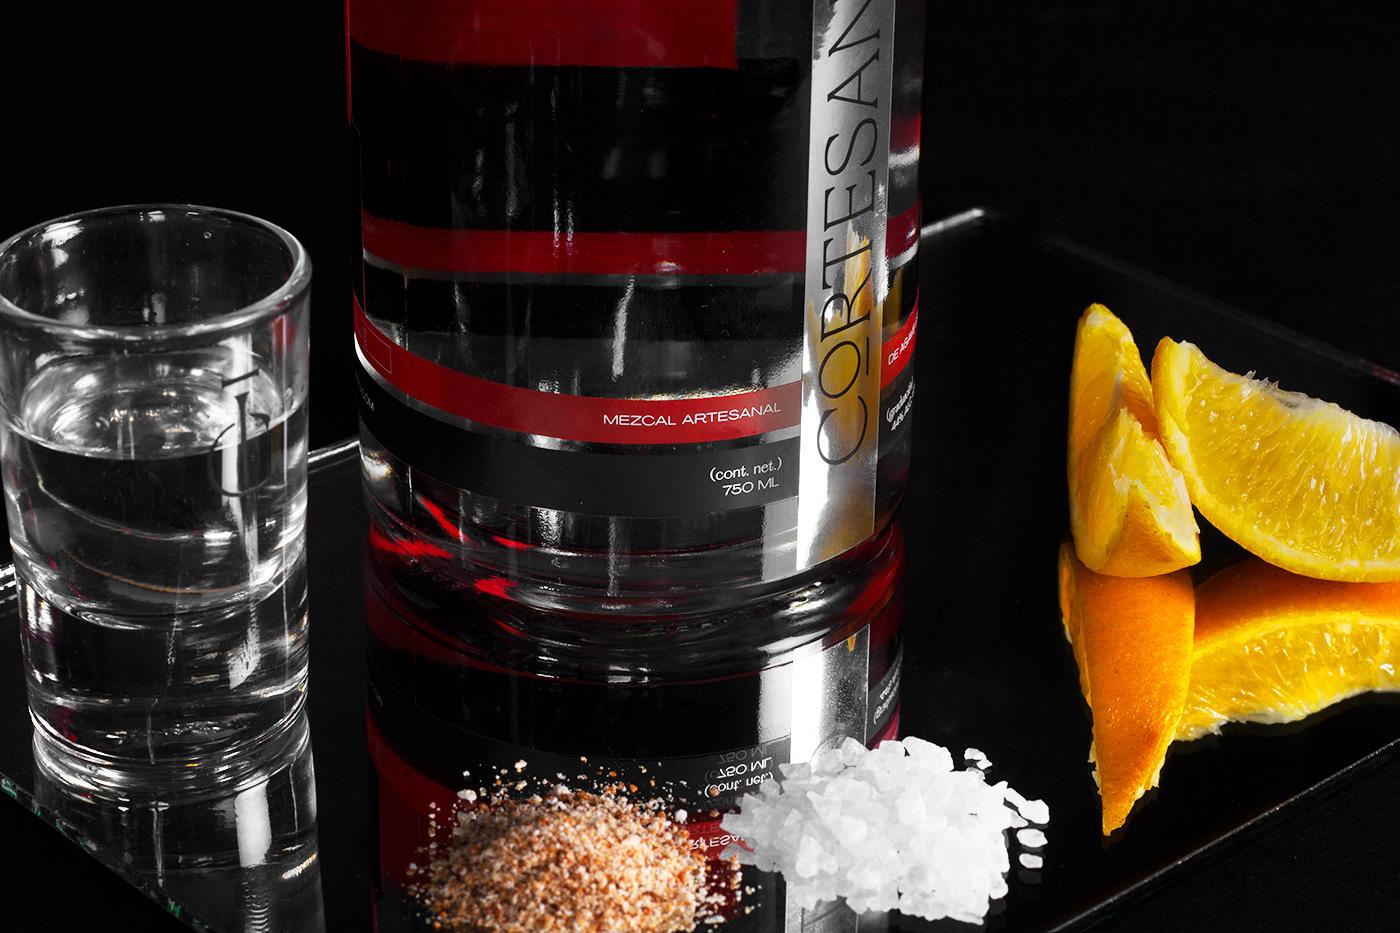 alcohol beverage drinks mexico mezcal oaxaca Tequila artisanal bottle Spirits